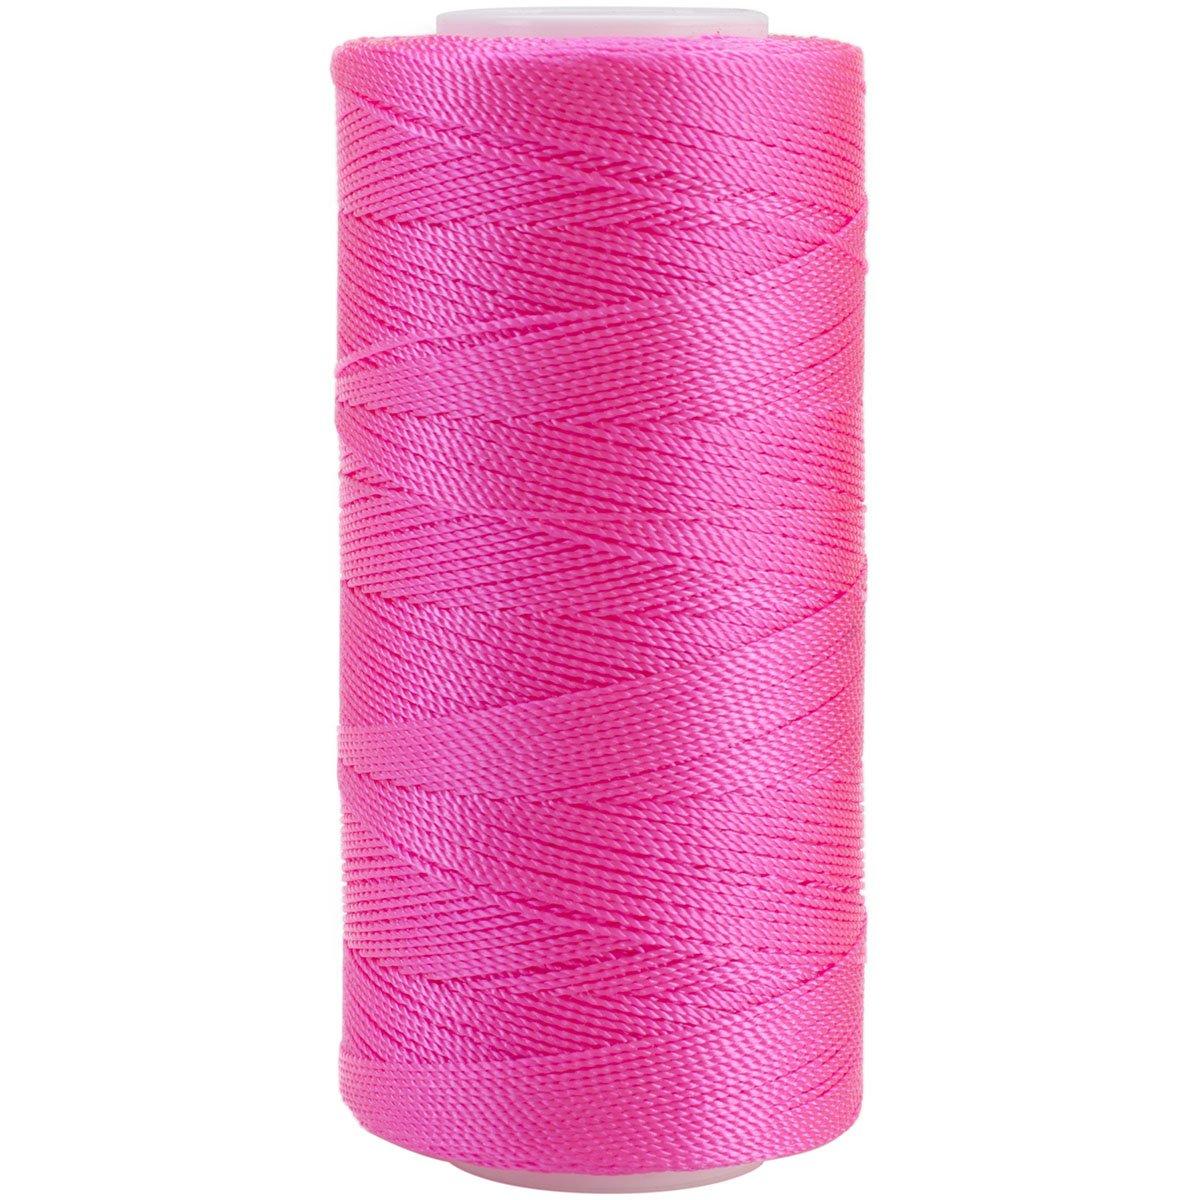 Iris 2-416 Nylon Crochet Thread, 300-Yard, Bright Pink